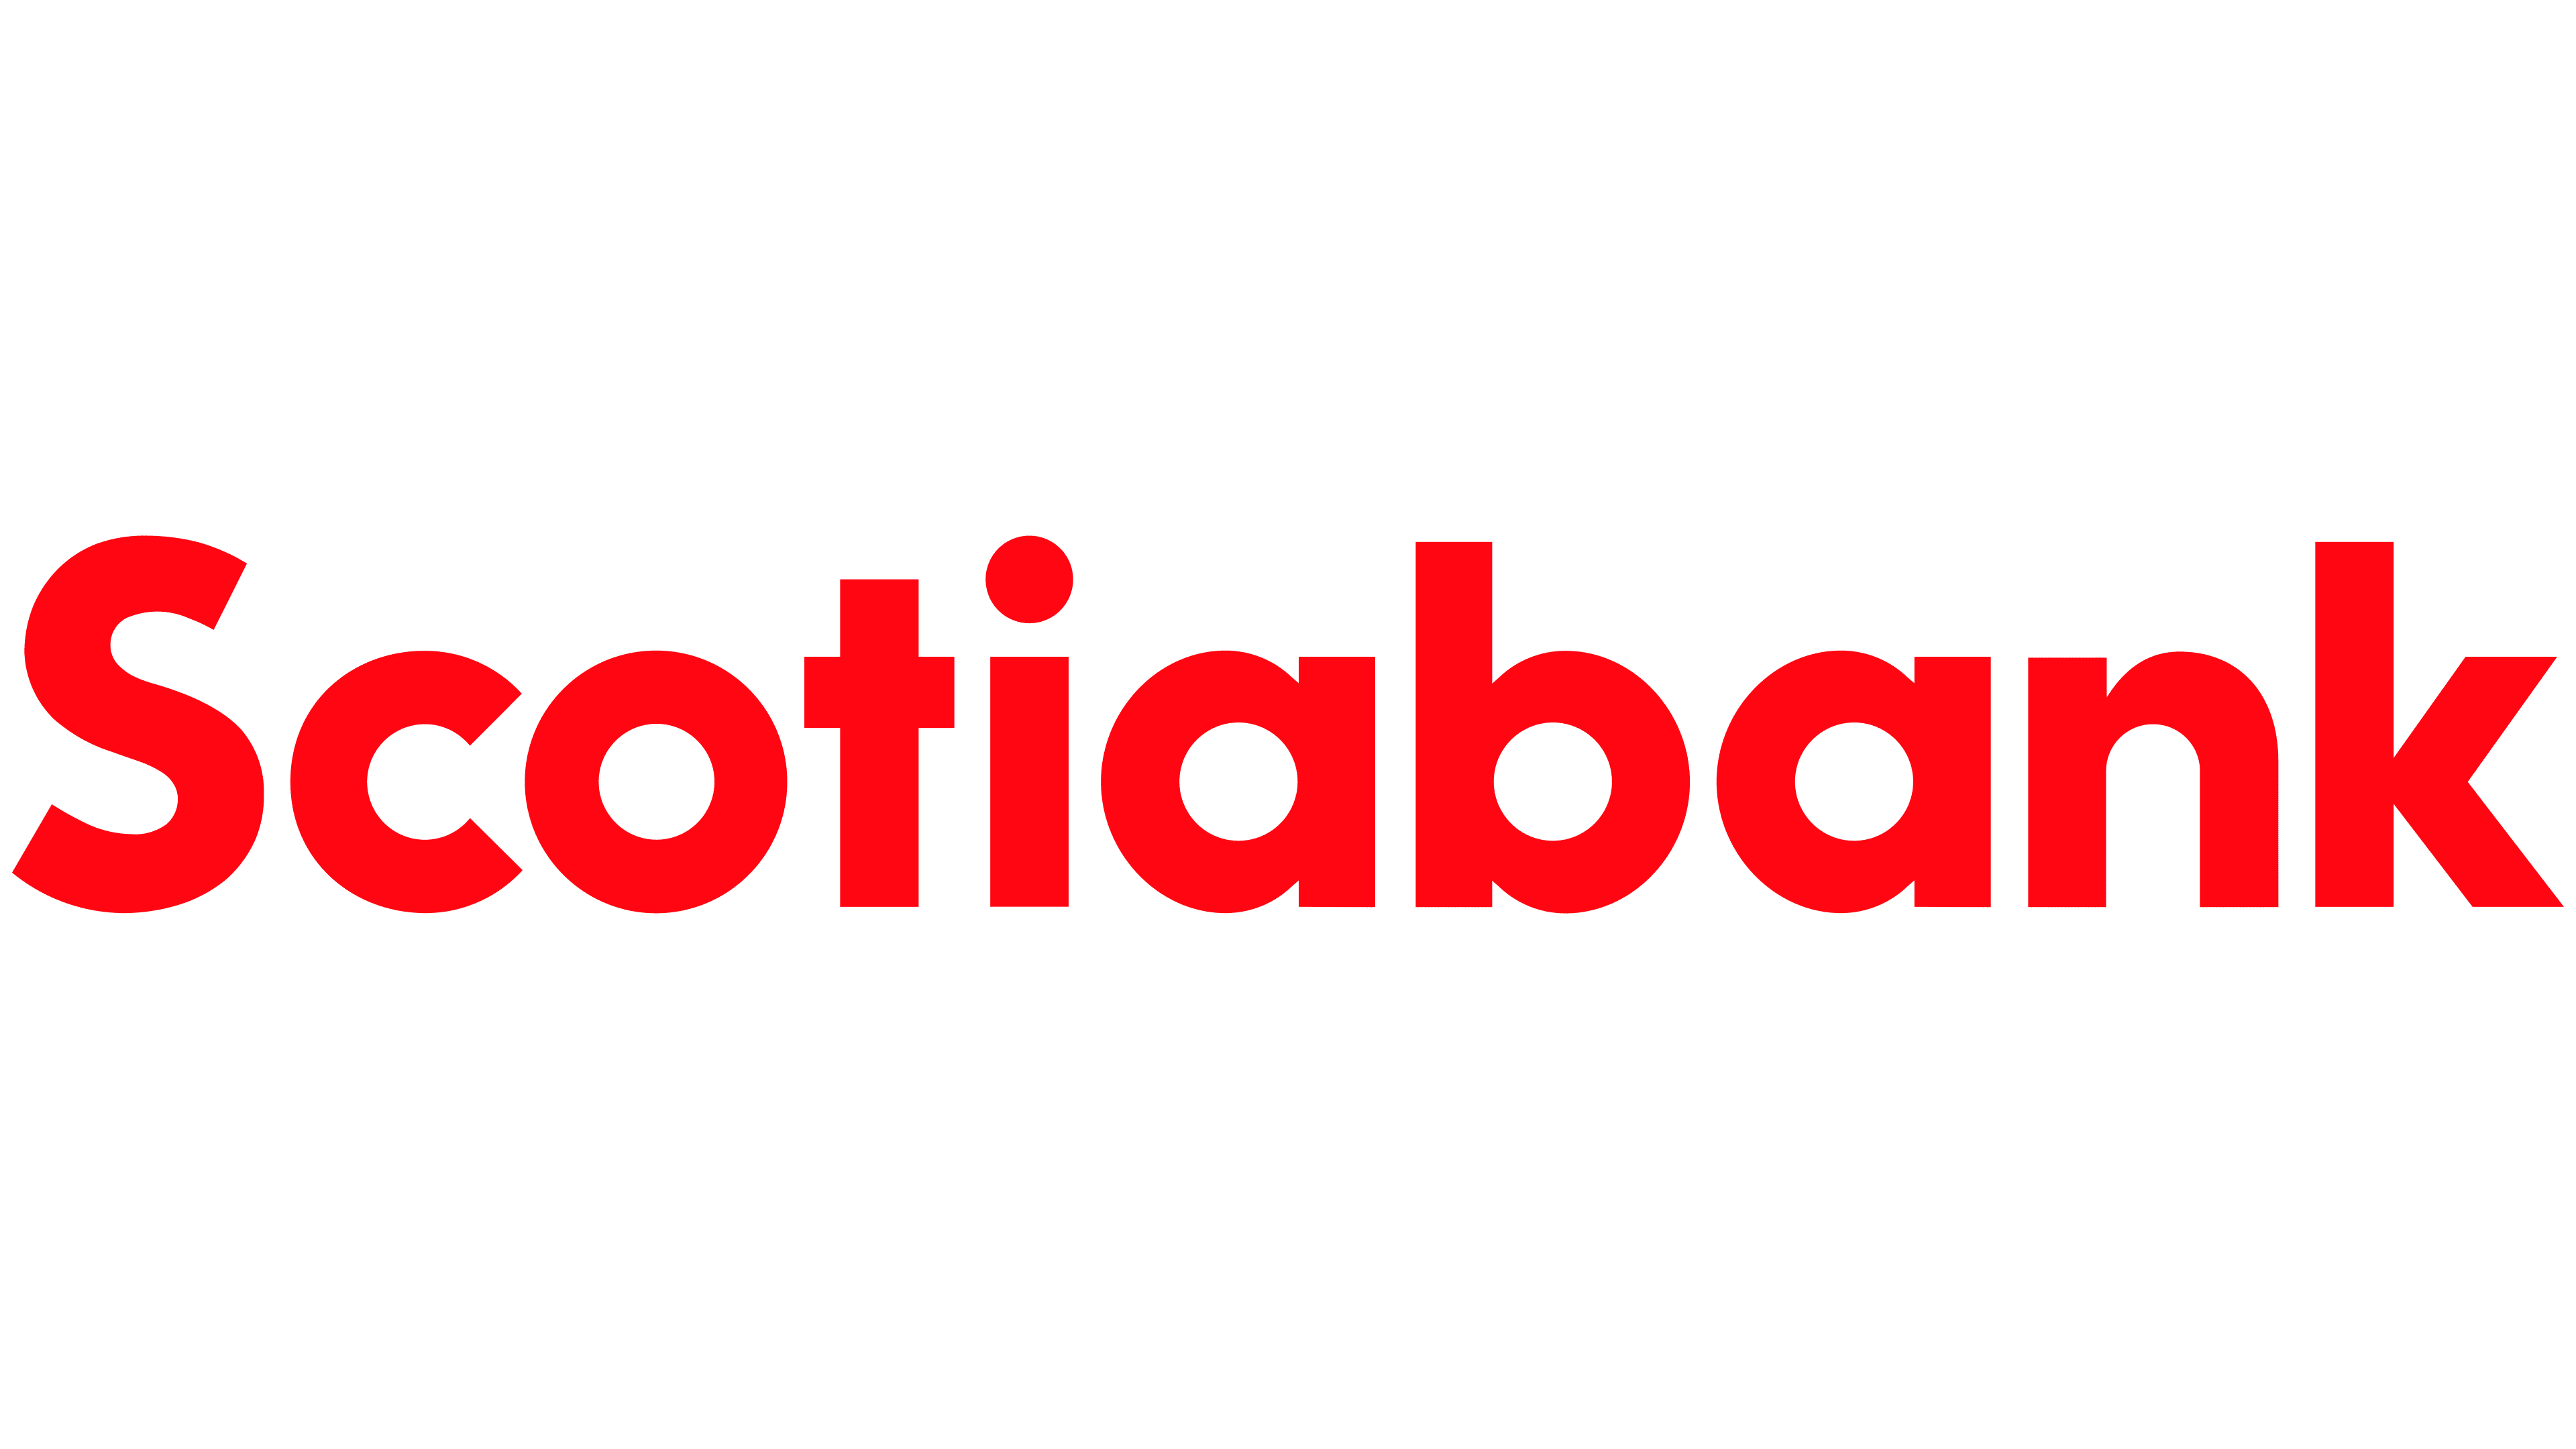 Integration scotiabank people